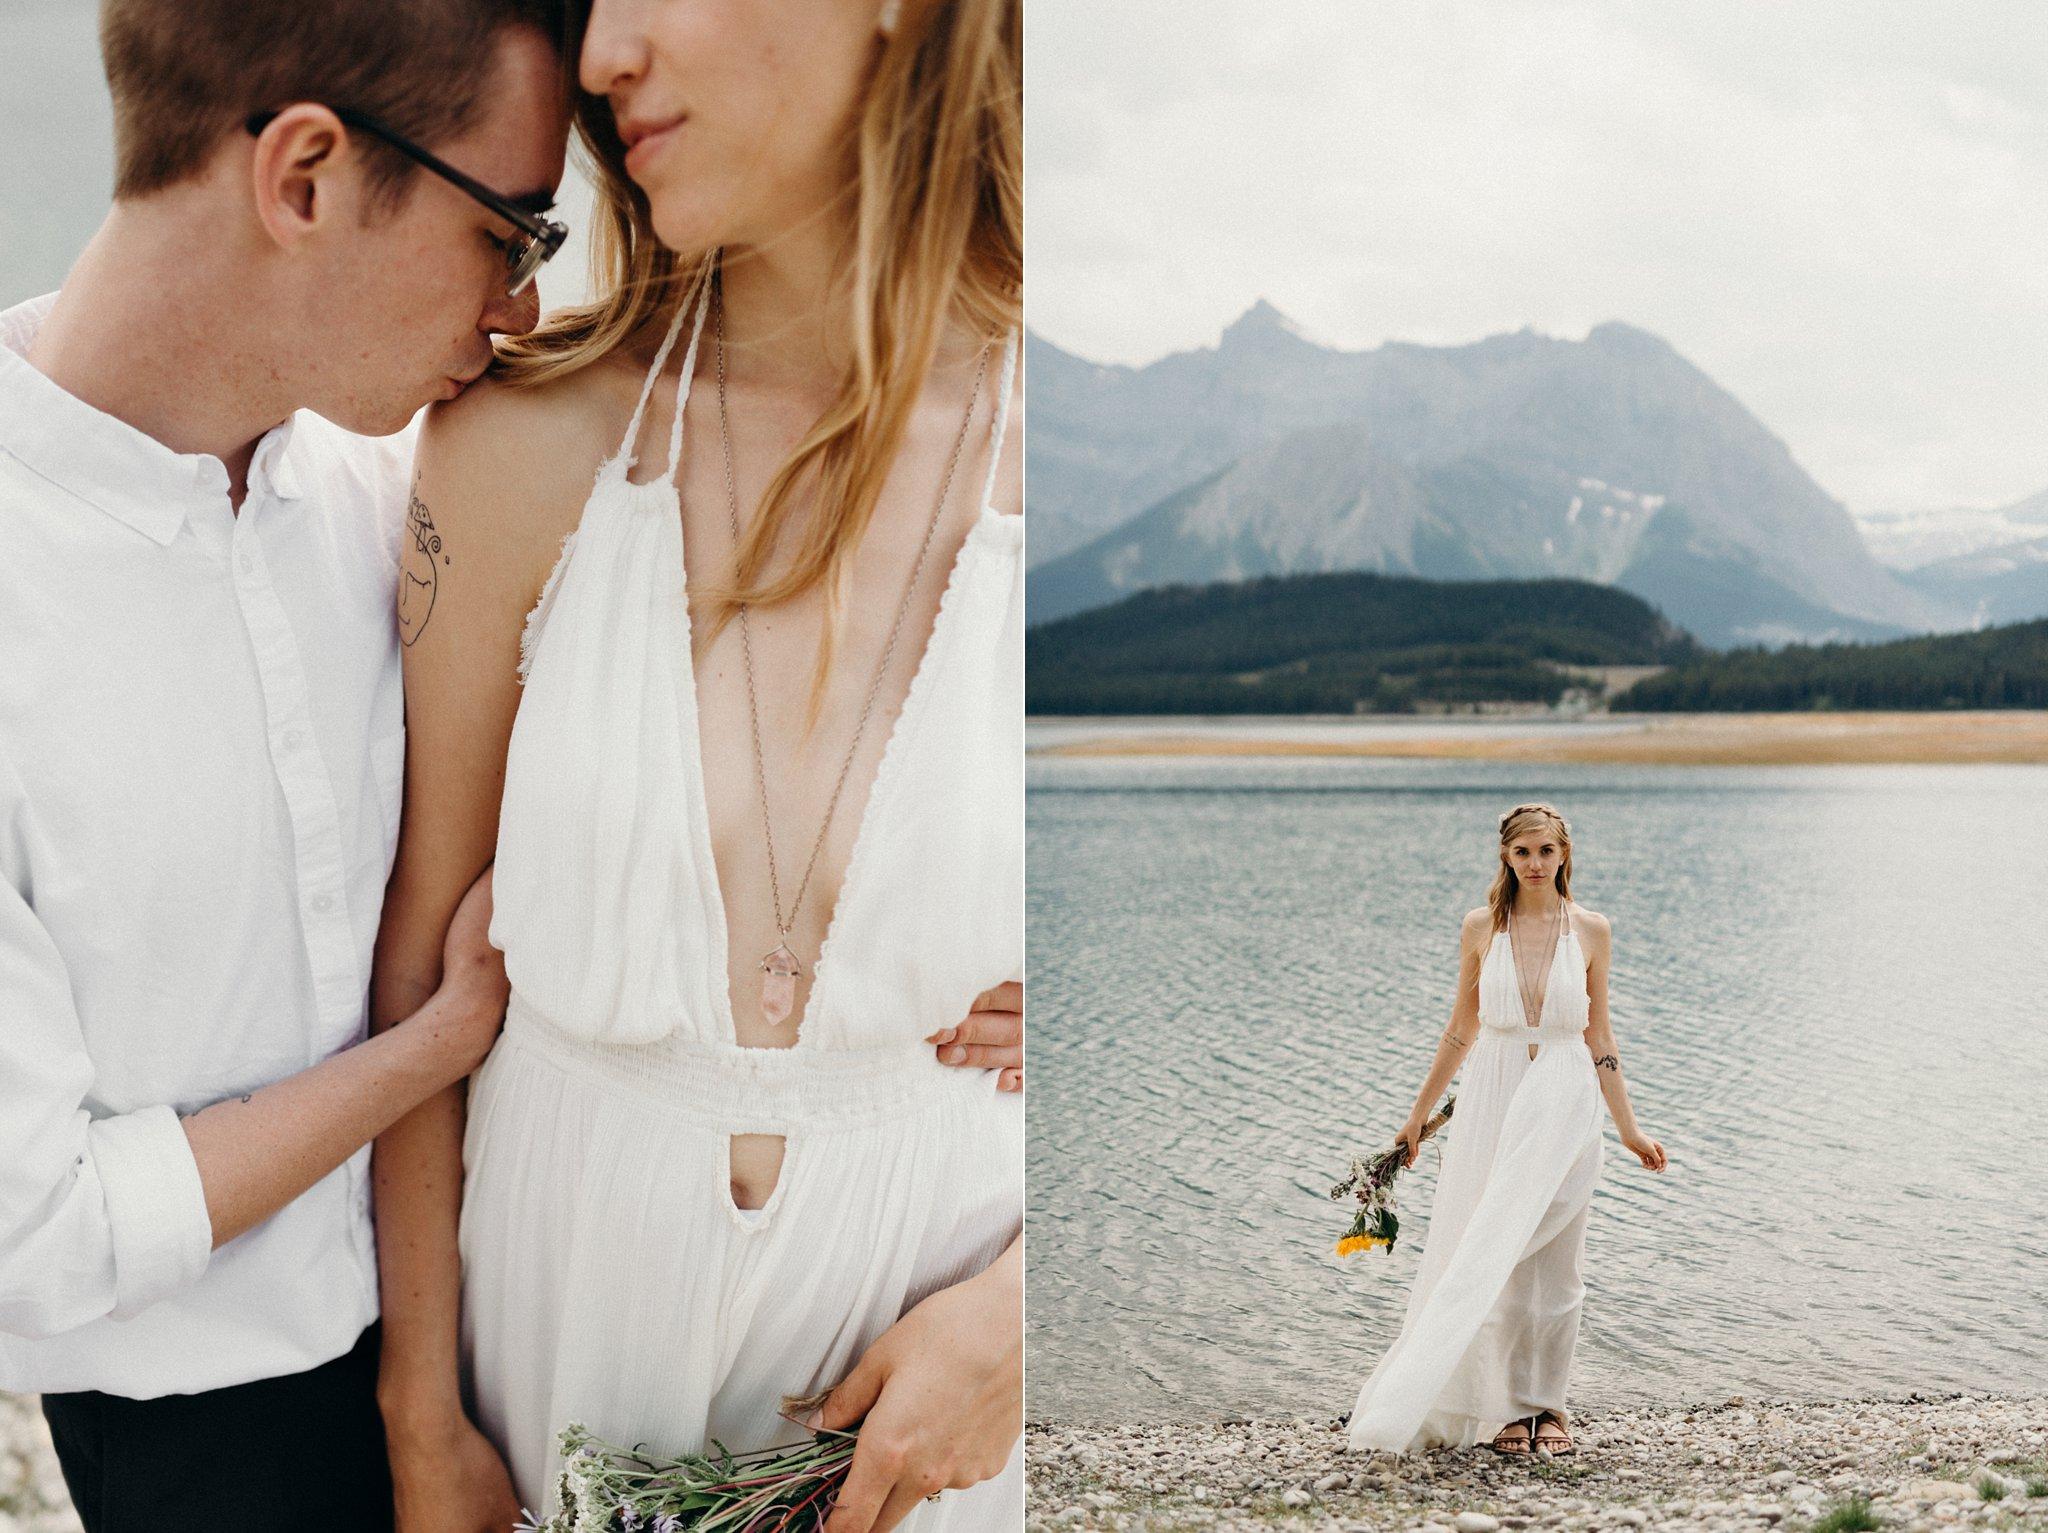 kaihla_tonai_intimate_wedding_elopement_photographer_6404.jpg